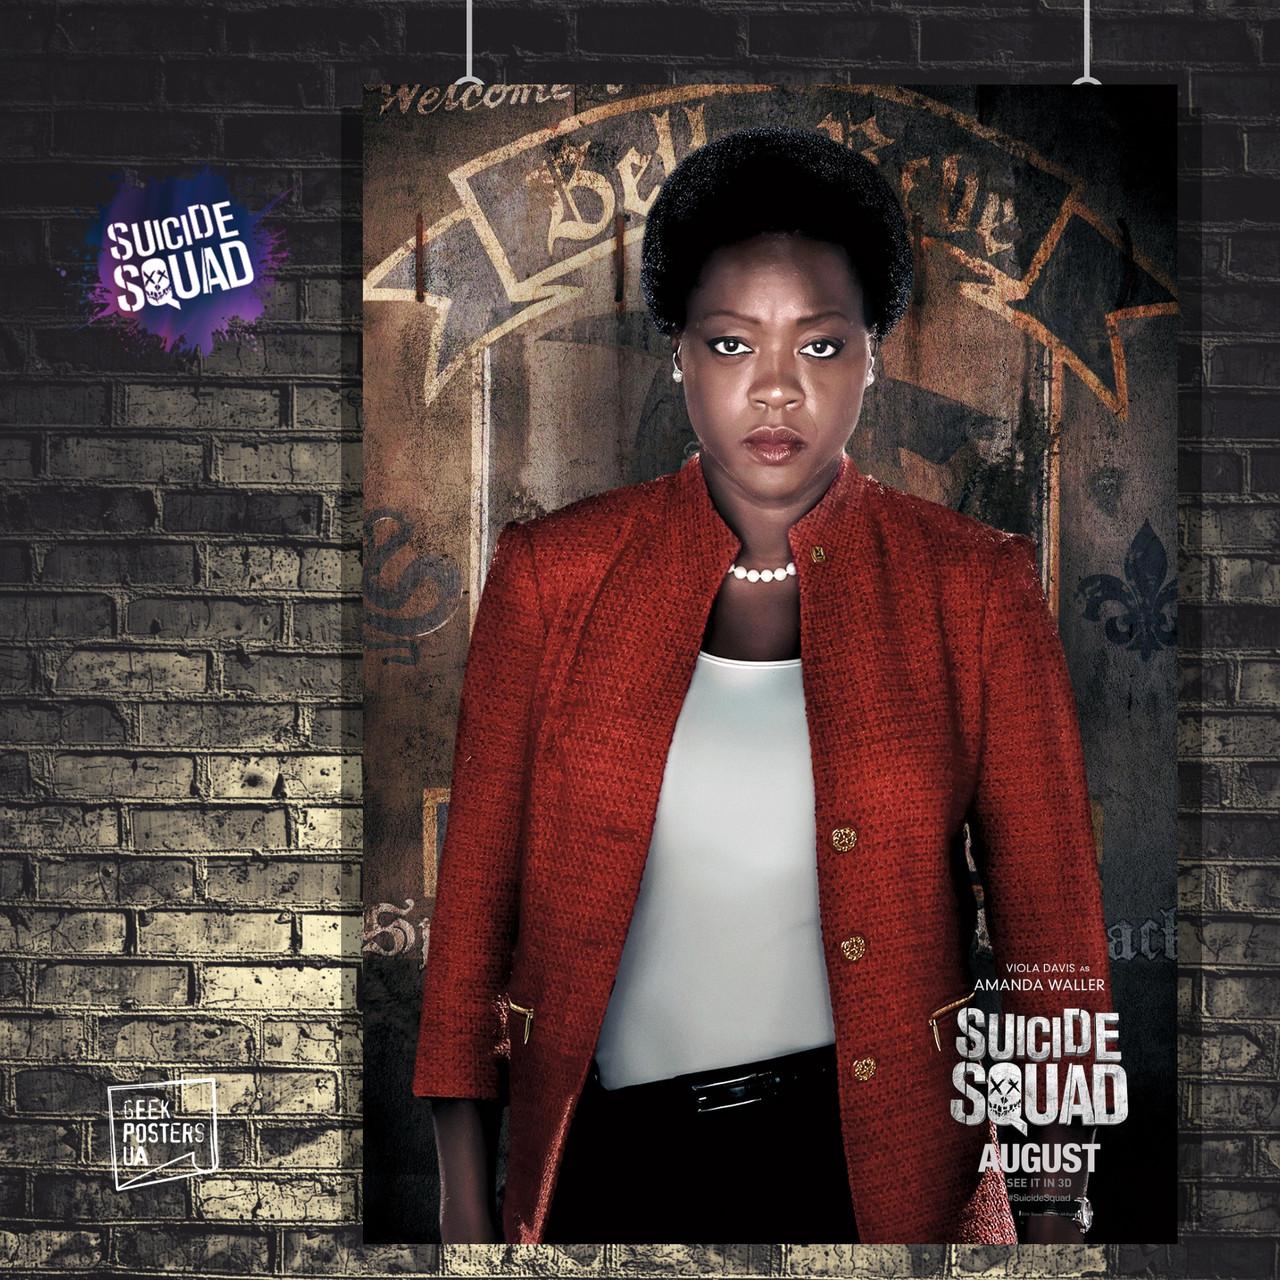 Постер Аманда Уоллер, Отряд Самоубийц, Suicide Squad. Размер 60x41см (A2). Глянцевая бумага